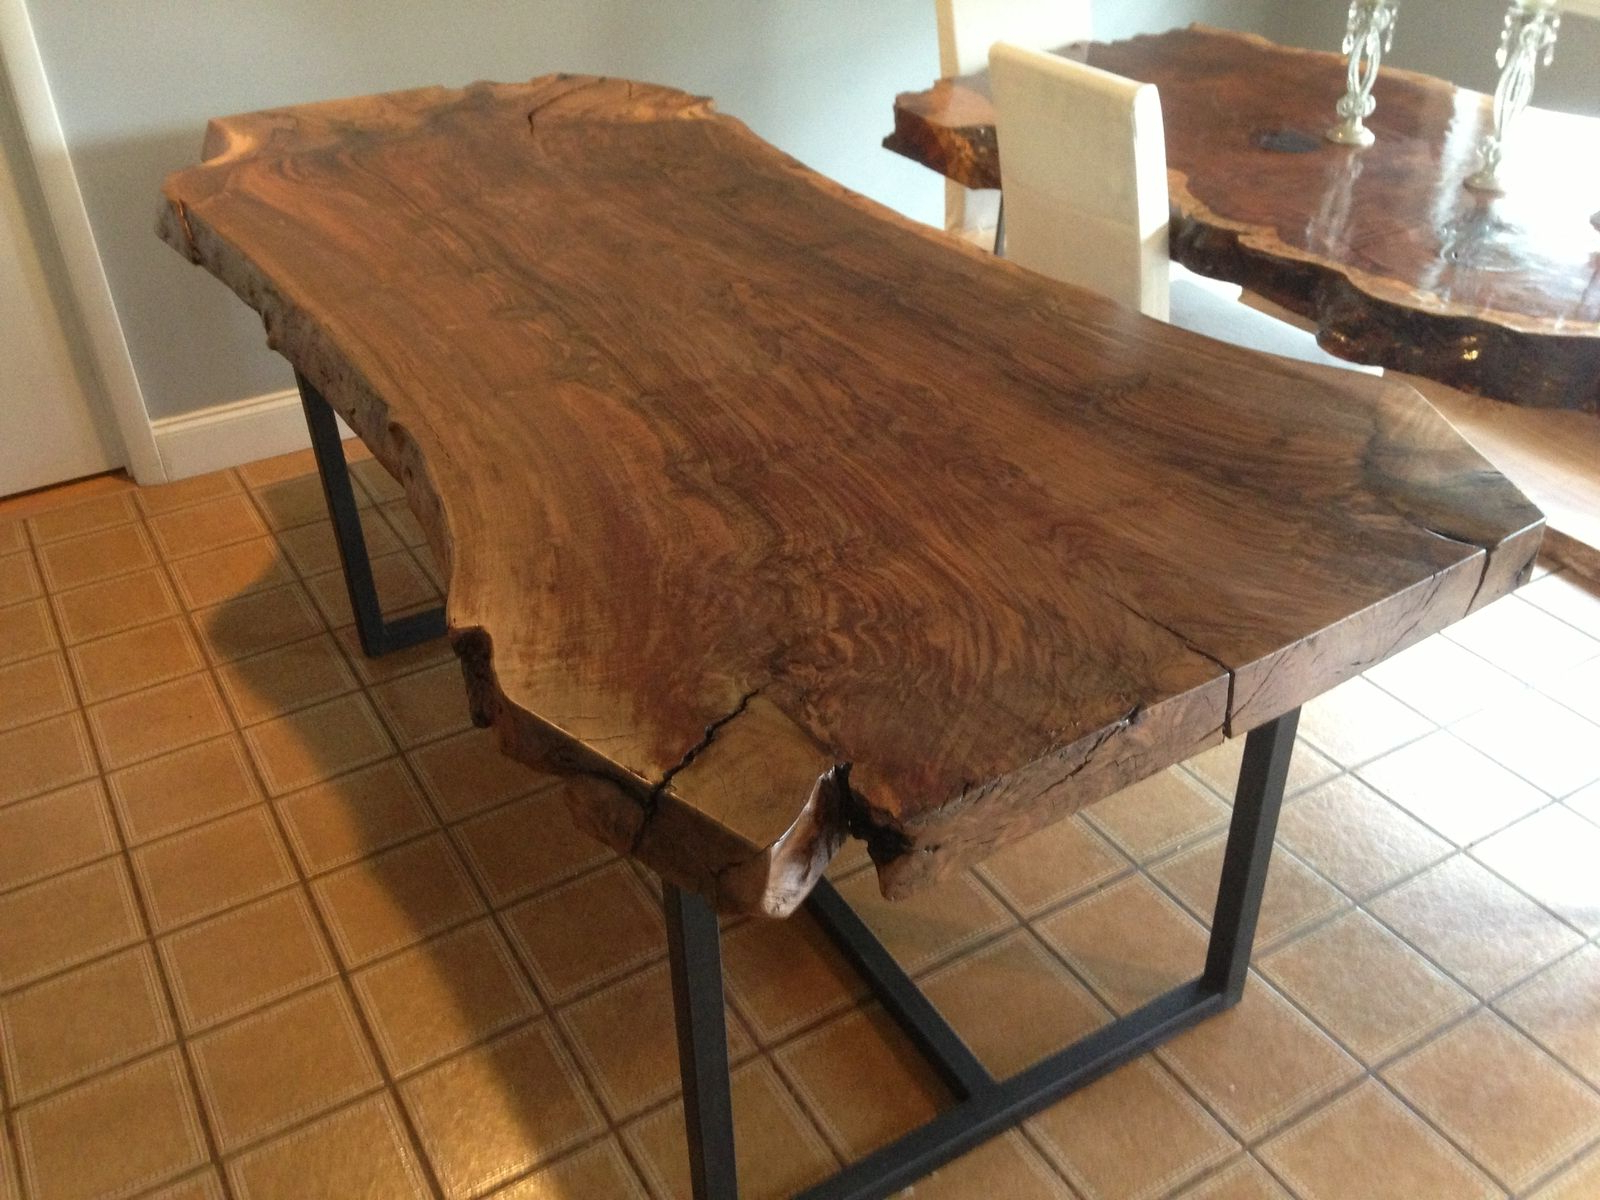 Popular Handmade Live Edge Claro Walnut Dining Tableozma Design With Walnut Finish Live Edge Wood Contemporary Dining Tables (View 4 of 25)